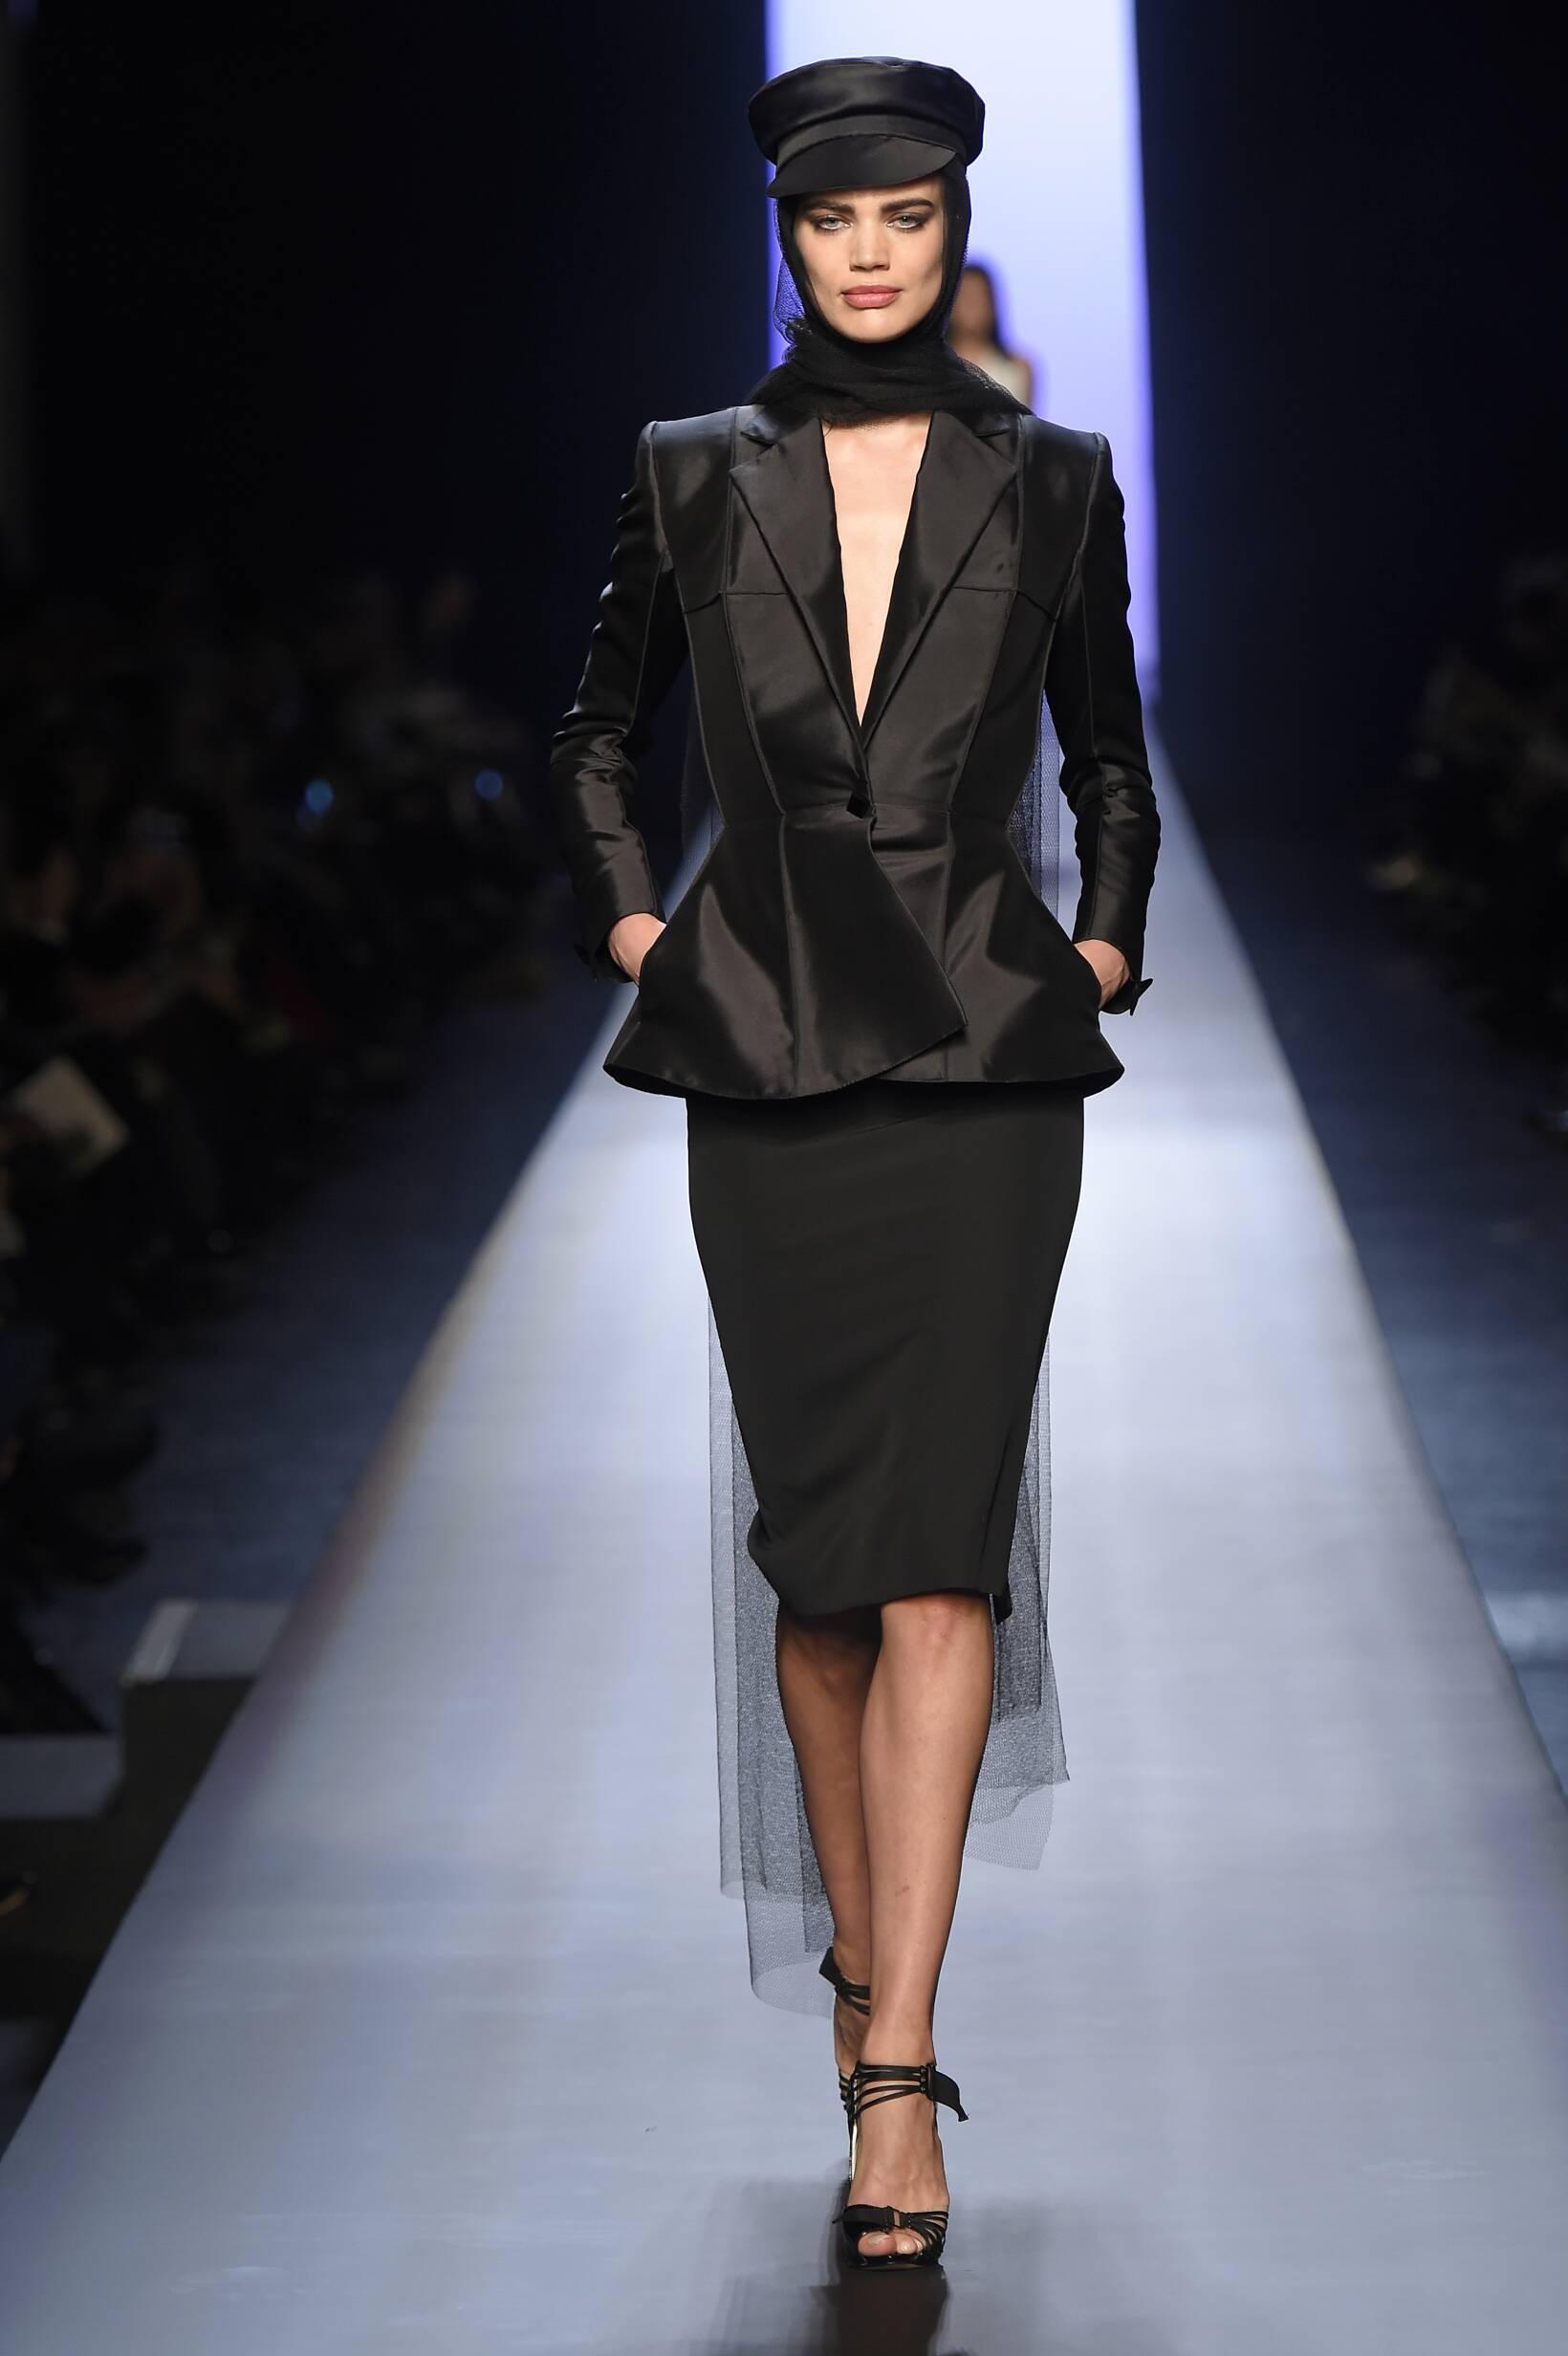 Fashion Model Jean Paul Gaultier Haute Couture Collection Catwalk